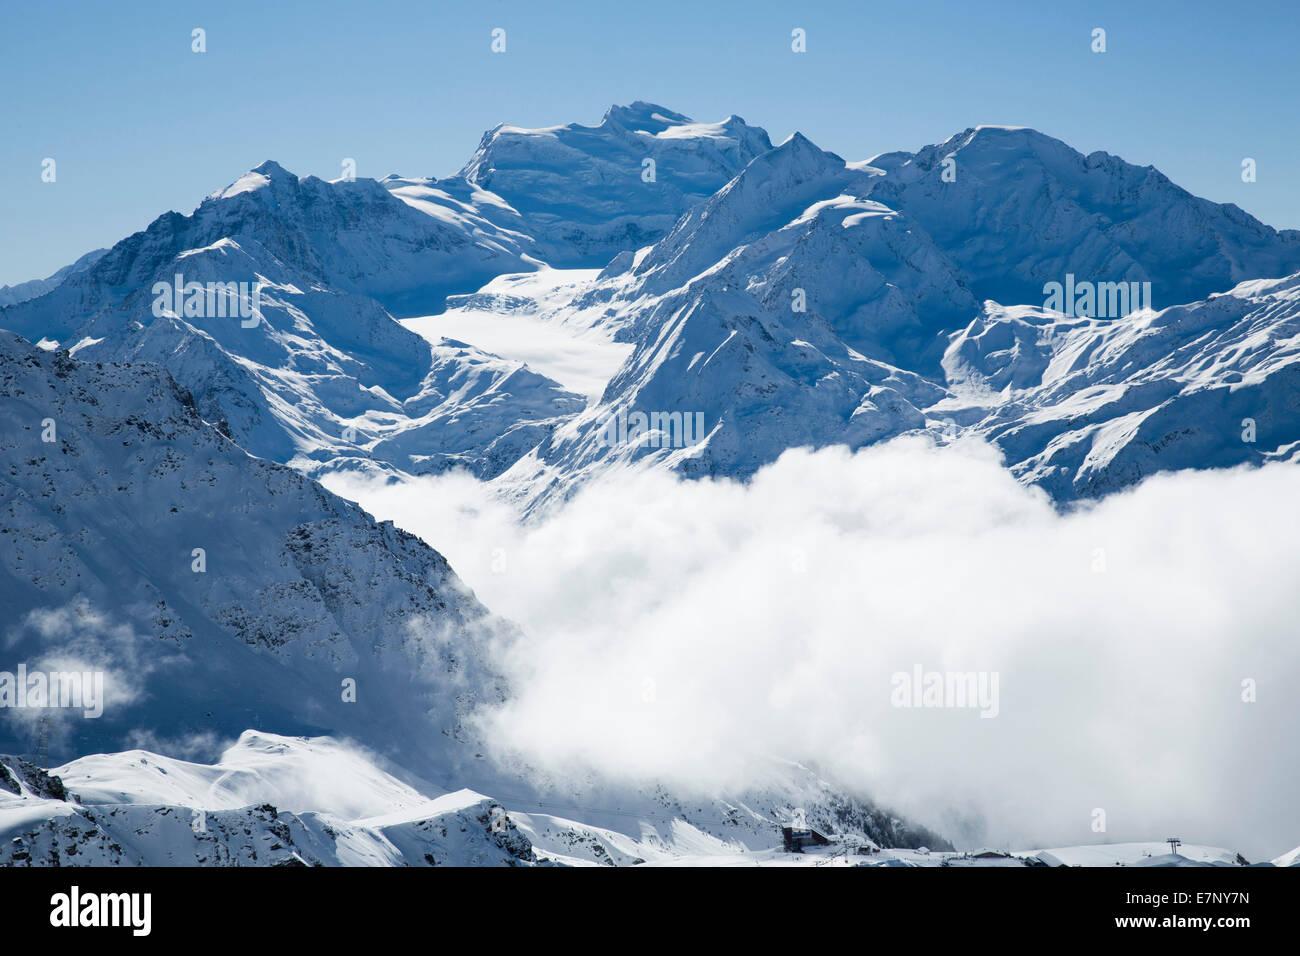 Winter, Grand Combin, winter, canton, VS, Valais, mountain, mountains, Switzerland, Europe, - Stock Image